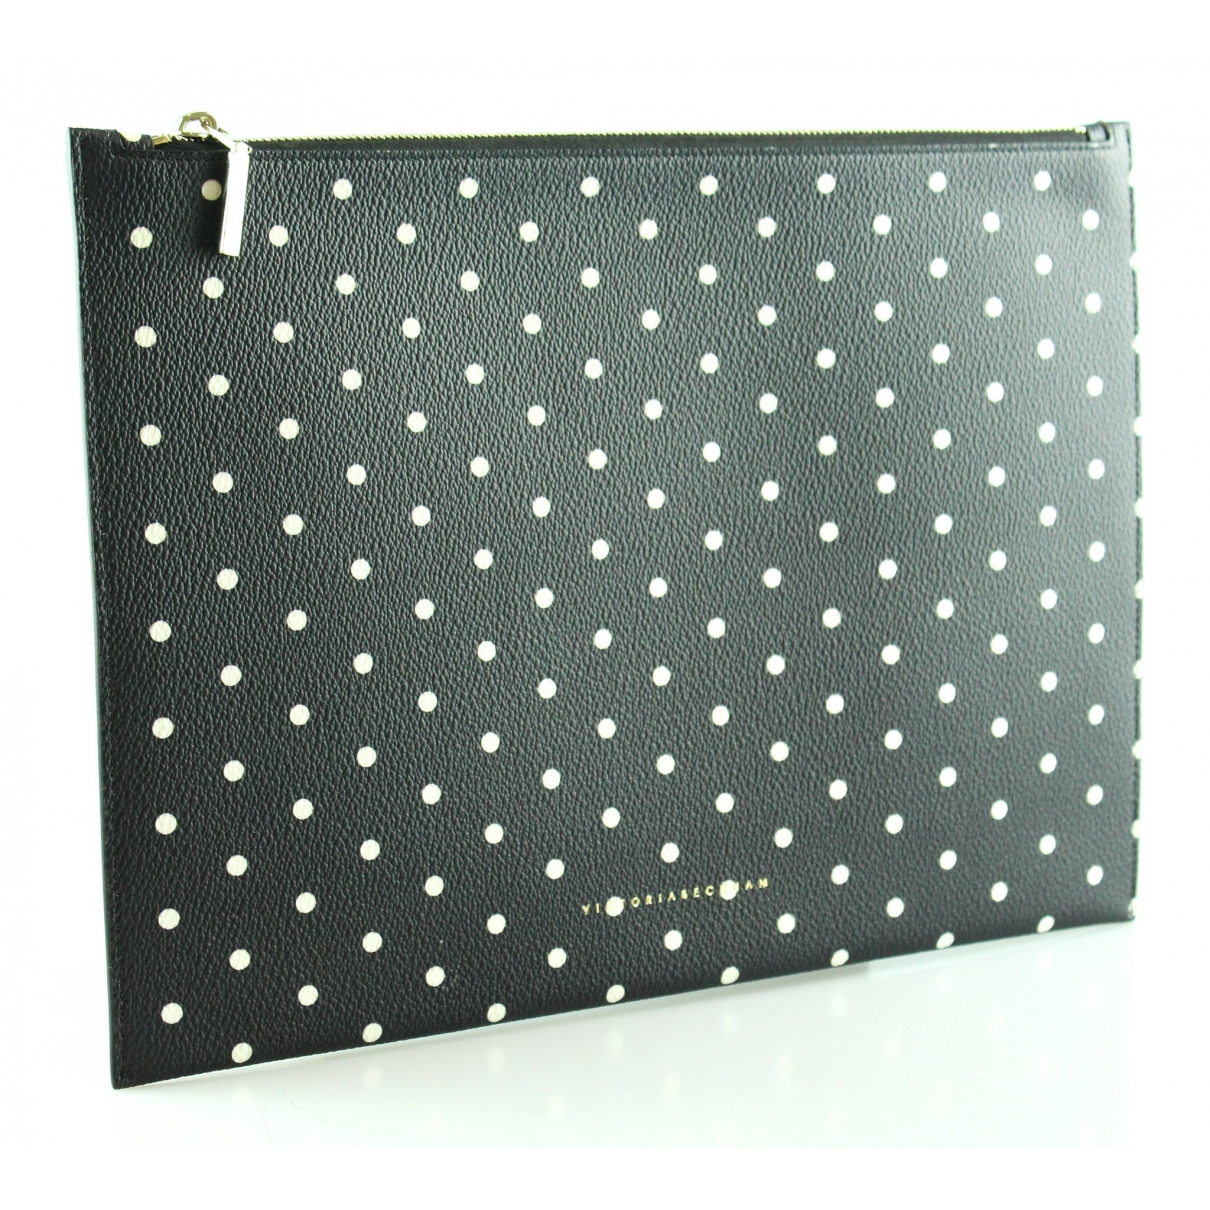 Victoria Beckham \N Black Leather Clutch bag for Women \N